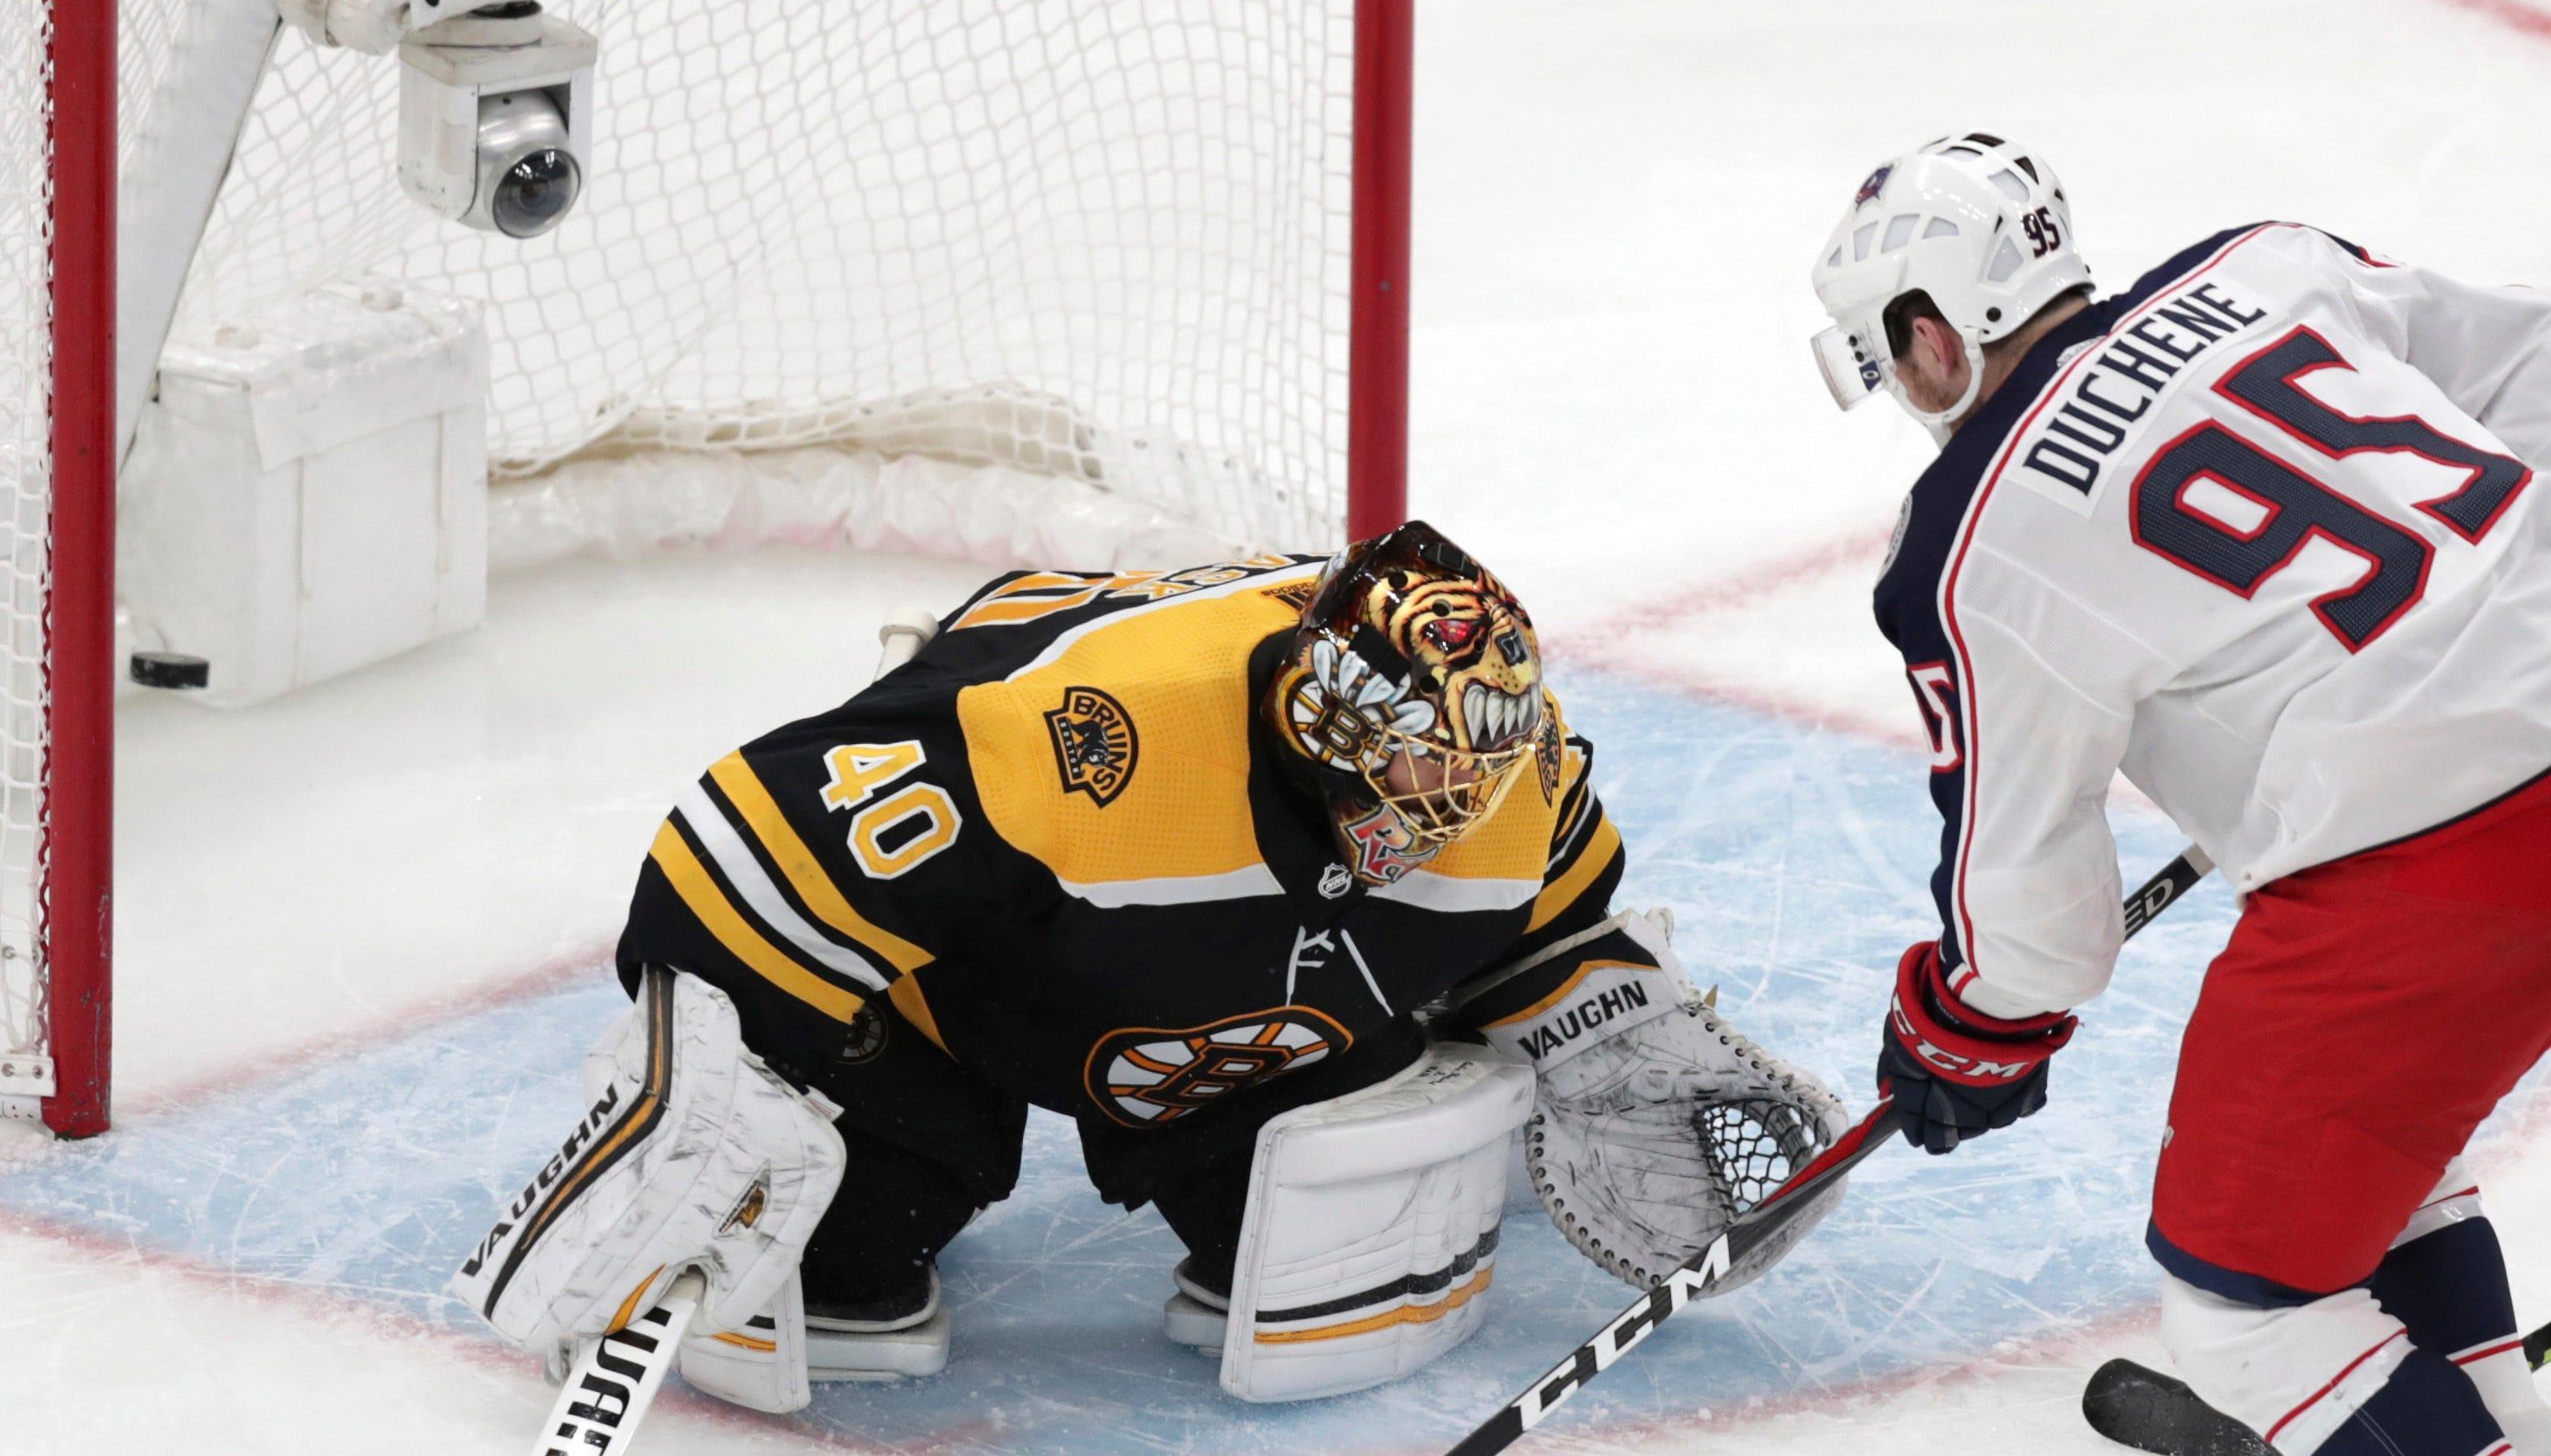 Second round: Blue Jackets center Matt Duchene scores past Bruins goaltender Tuukka Rask during the second  overtime of Game 2 for a series-tying 3-2 victory.